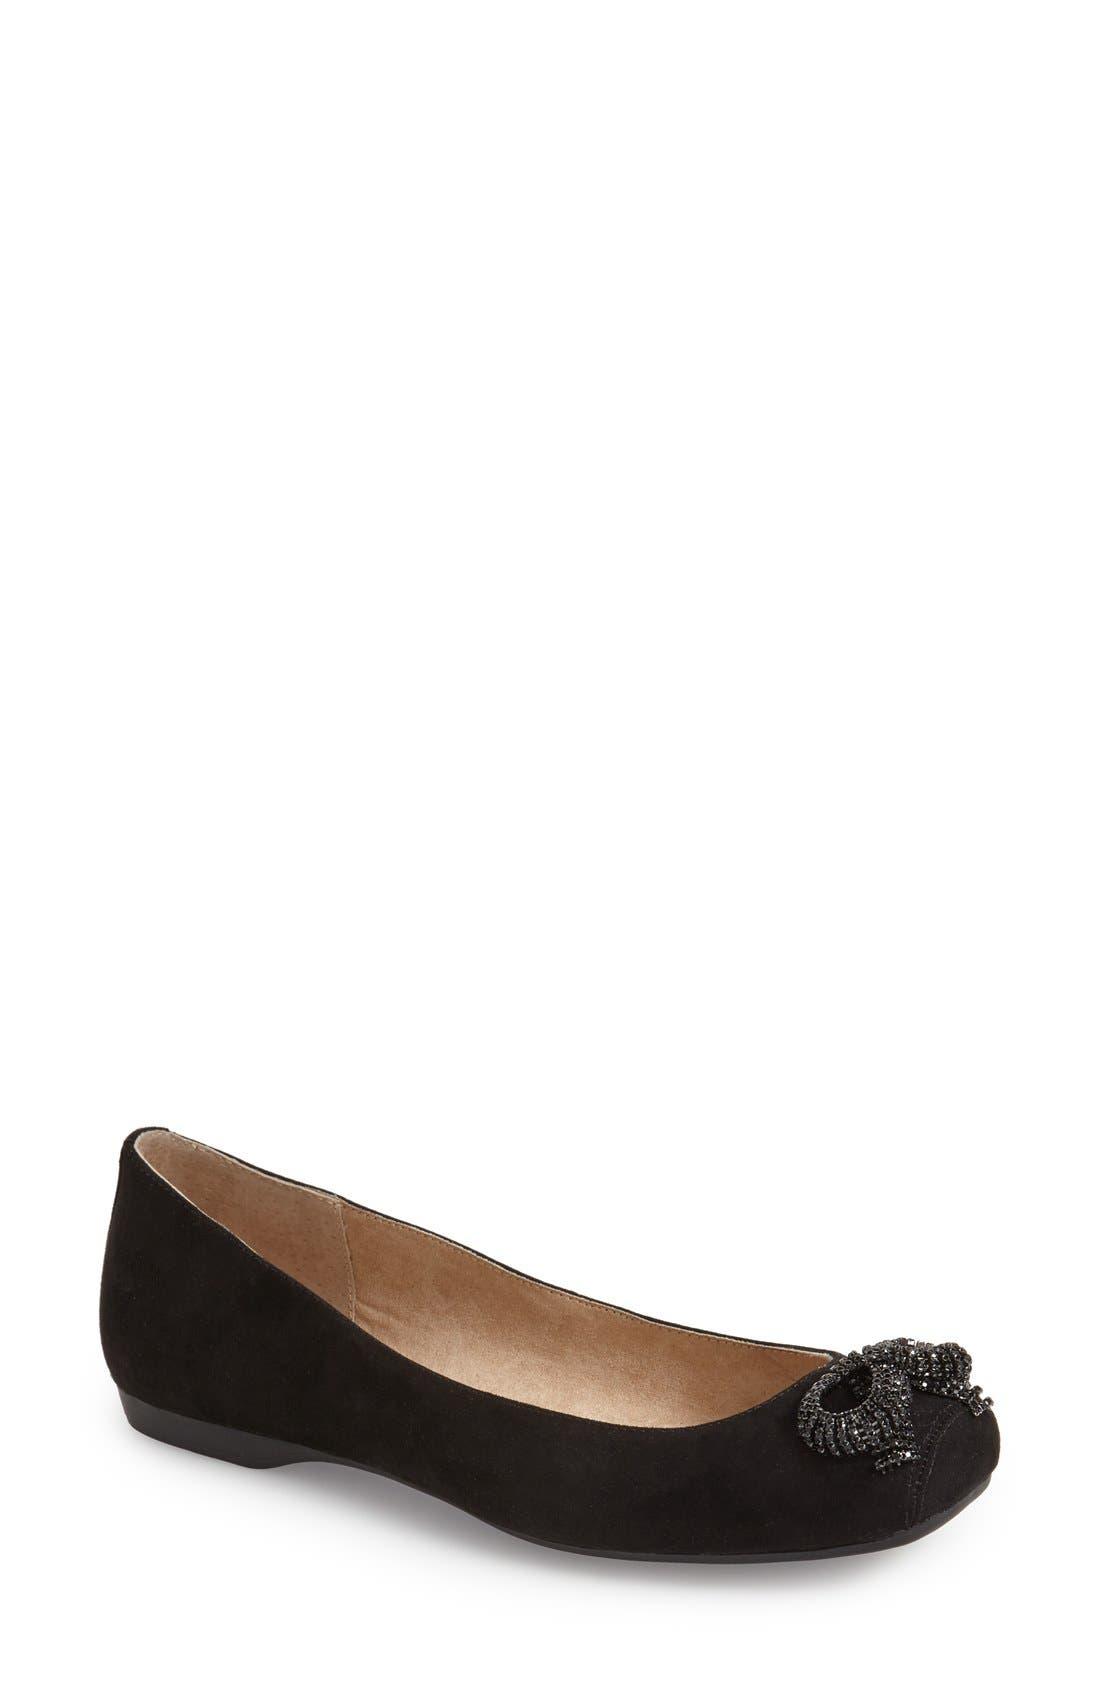 Alternate Image 1 Selected - Jessica Simpson 'Marelda' Square Toe Flat (Women)